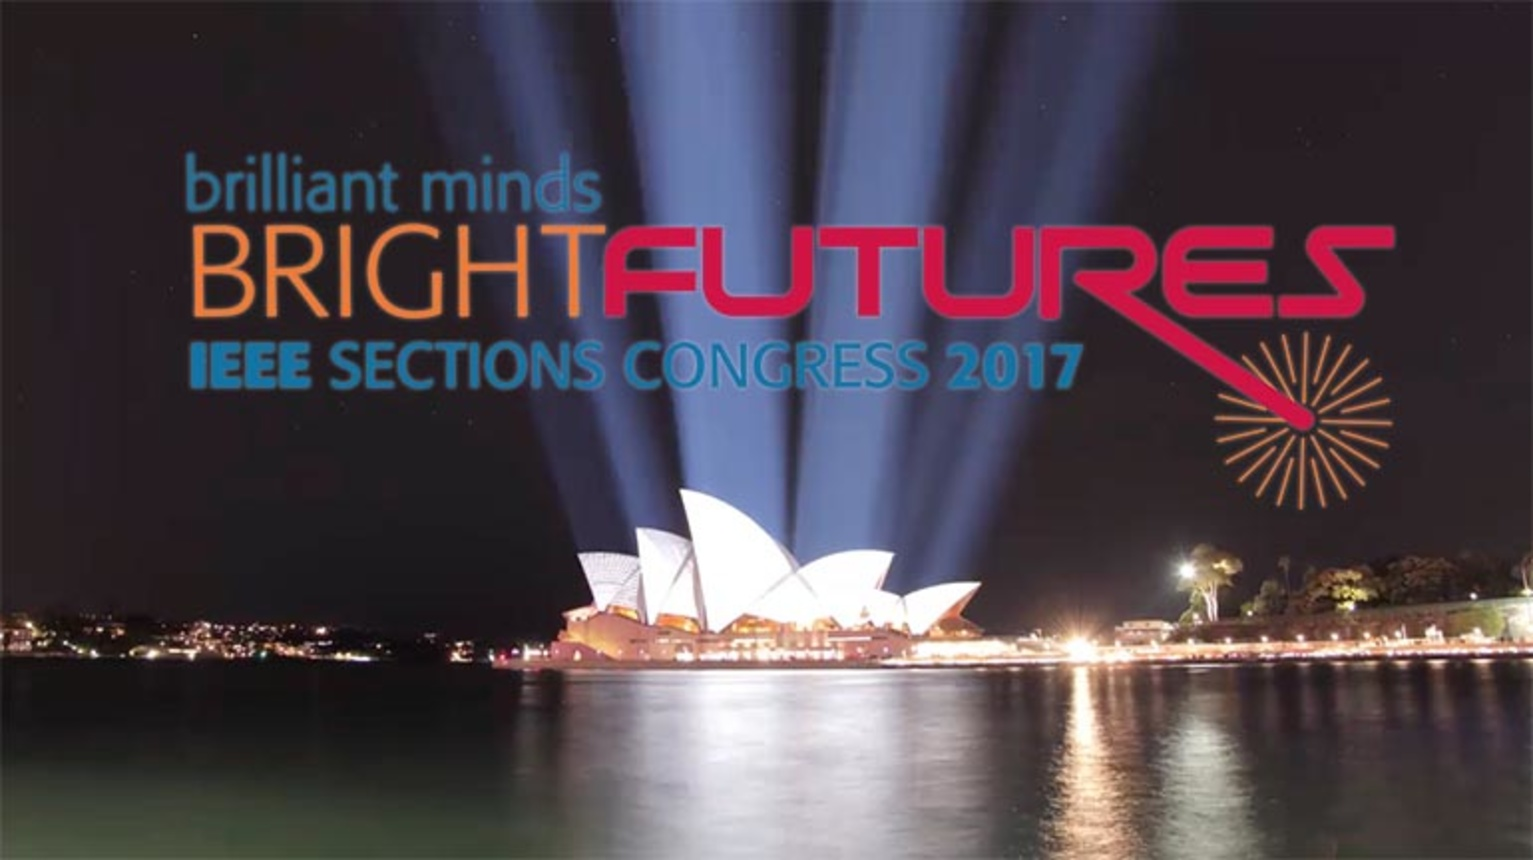 IEEE Sections Congress 2017 trailer